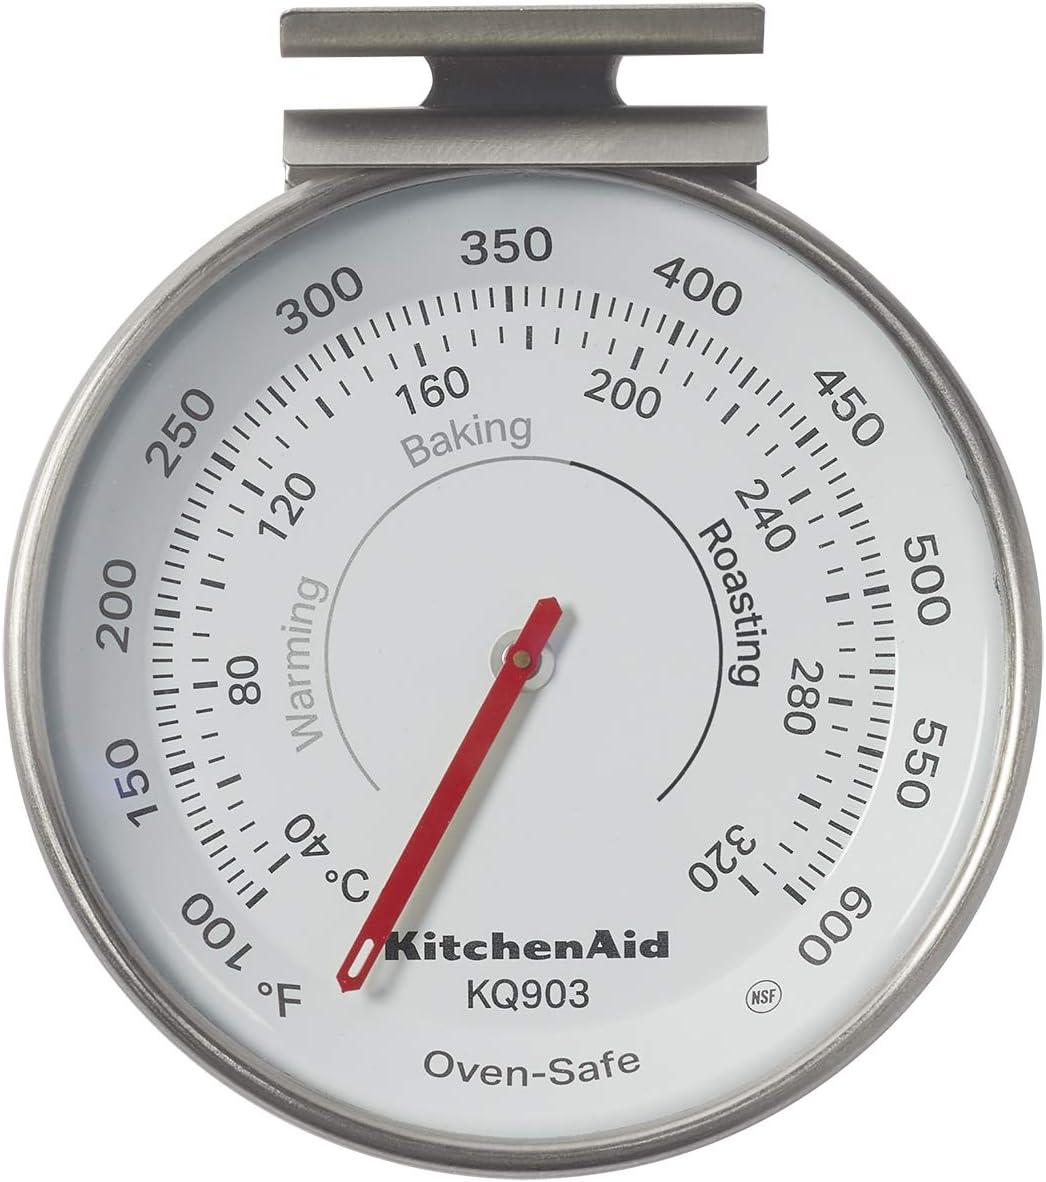 KitchenAid KQ903 3-in Dial Oven Thermometer, TEMPERATURE RANGE: 100°F to 600°F, Black